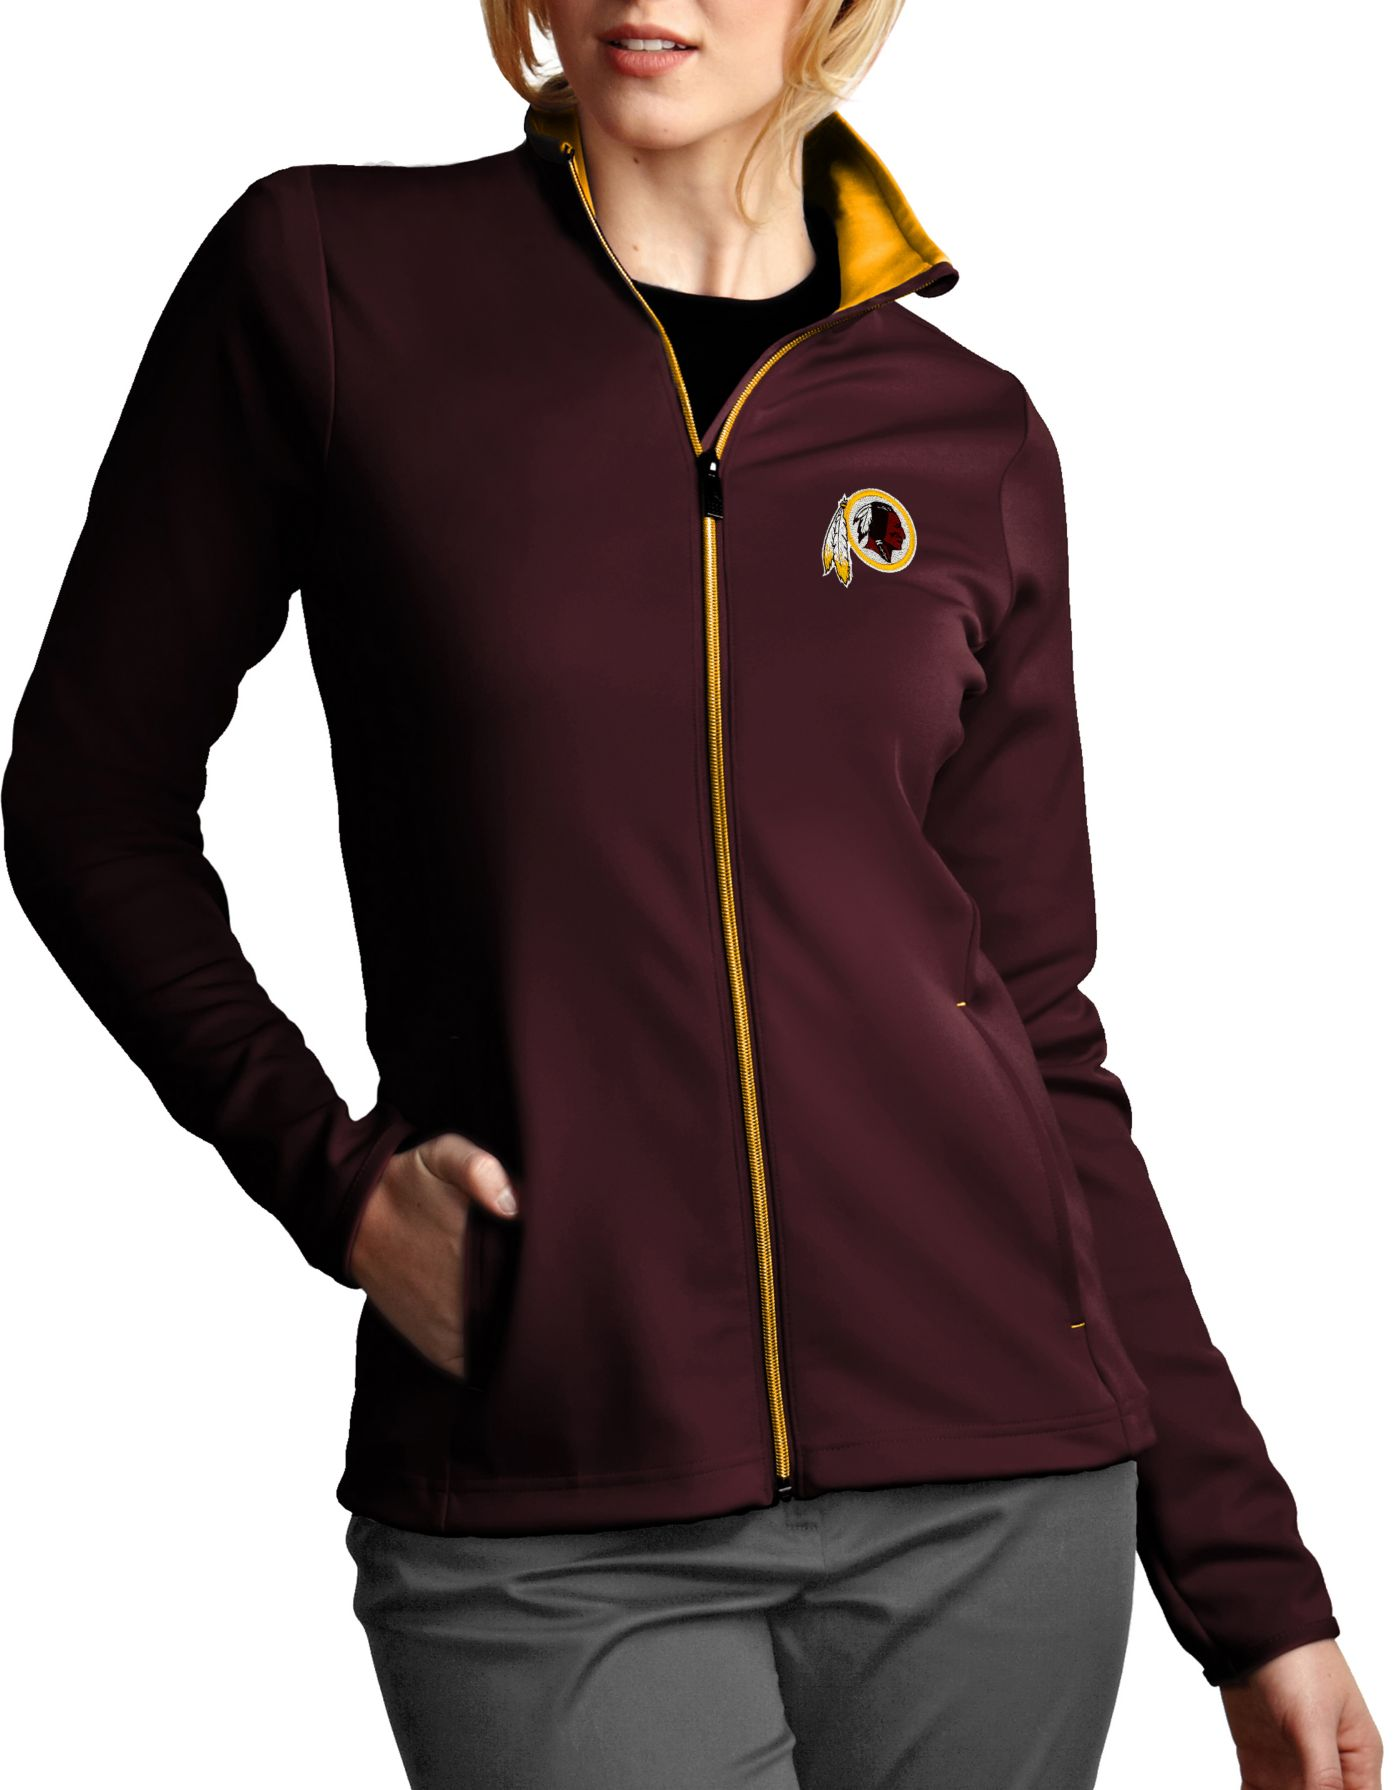 Antigua Women's Washington Redskins Leader Full-Zip Red Jacket